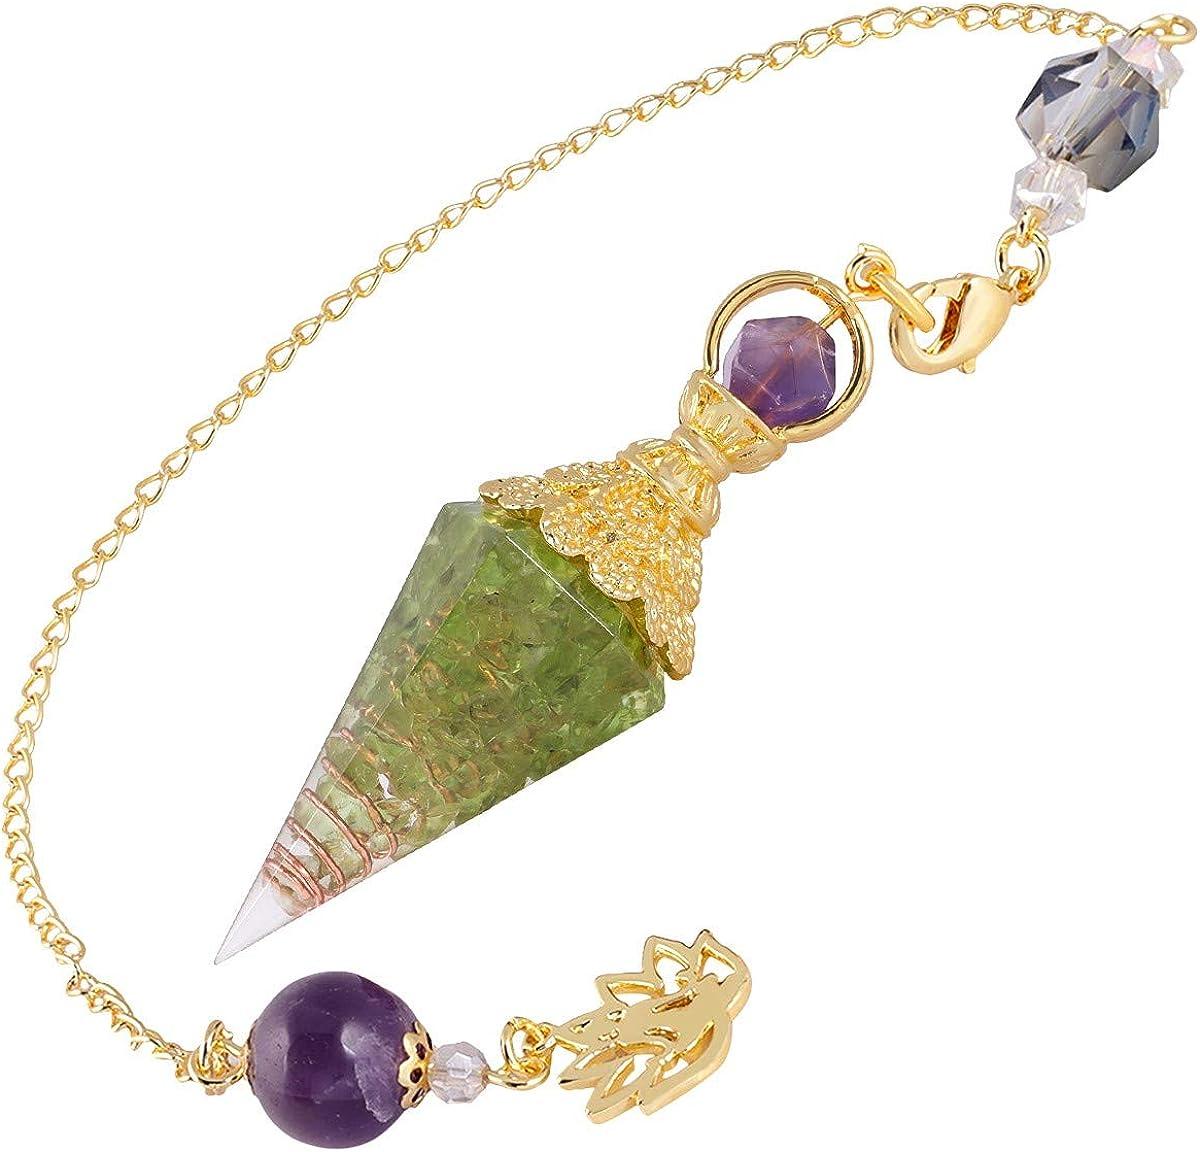 Nupuyai Orgone Crystal sale Pendulum for Large-scale sale Divination Go Reiki Dowsing